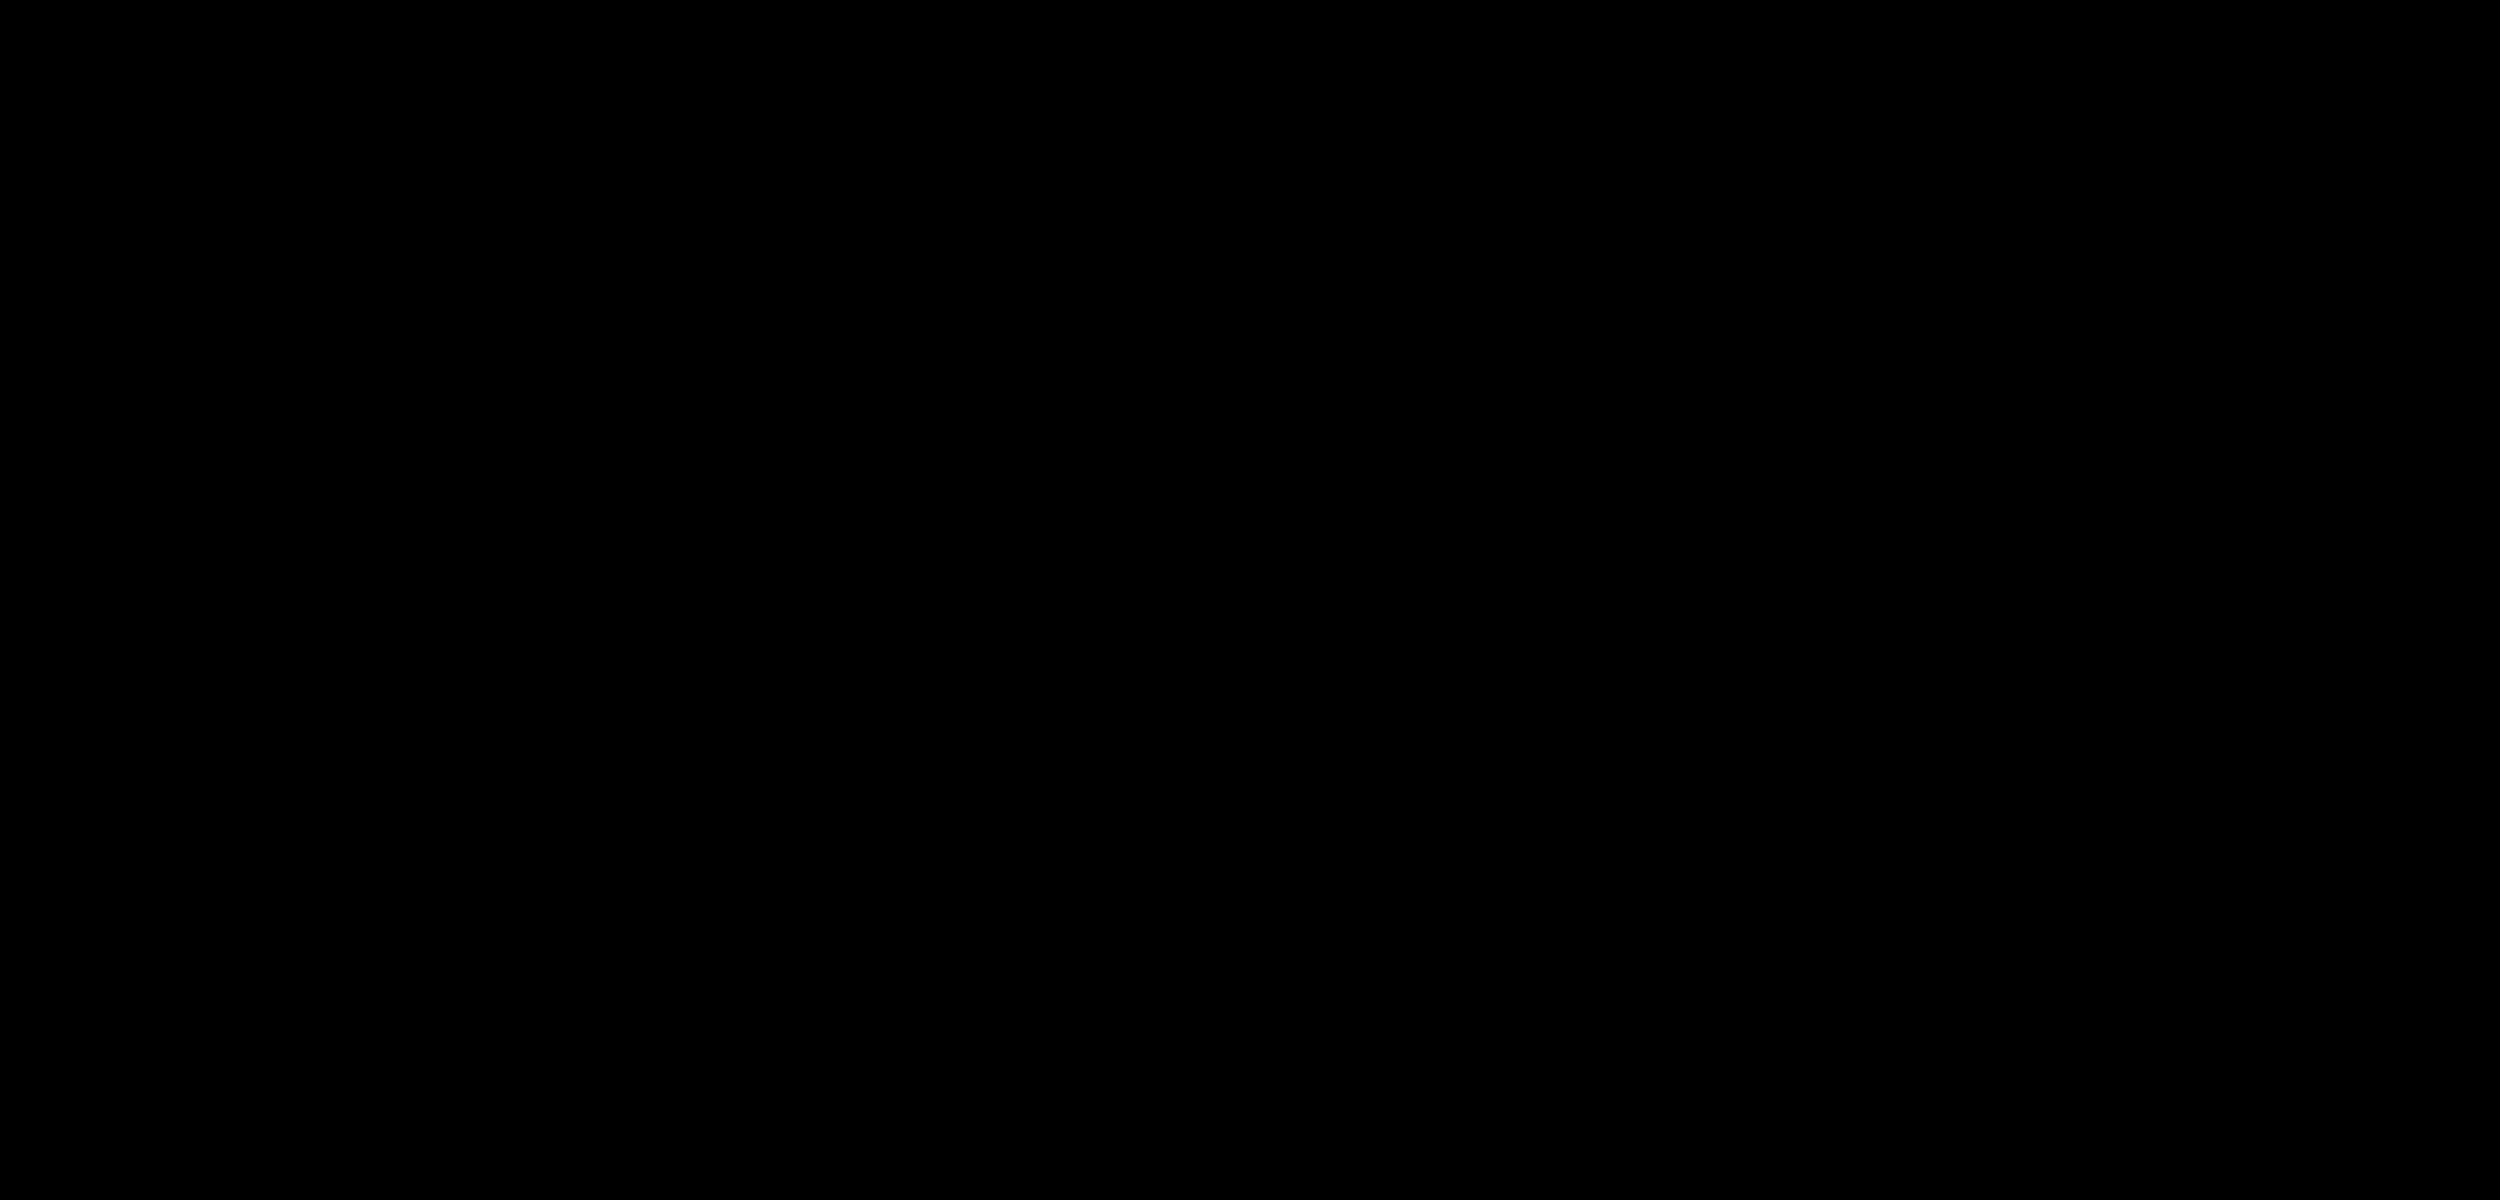 Index of /wp-content/uploads/2017/06